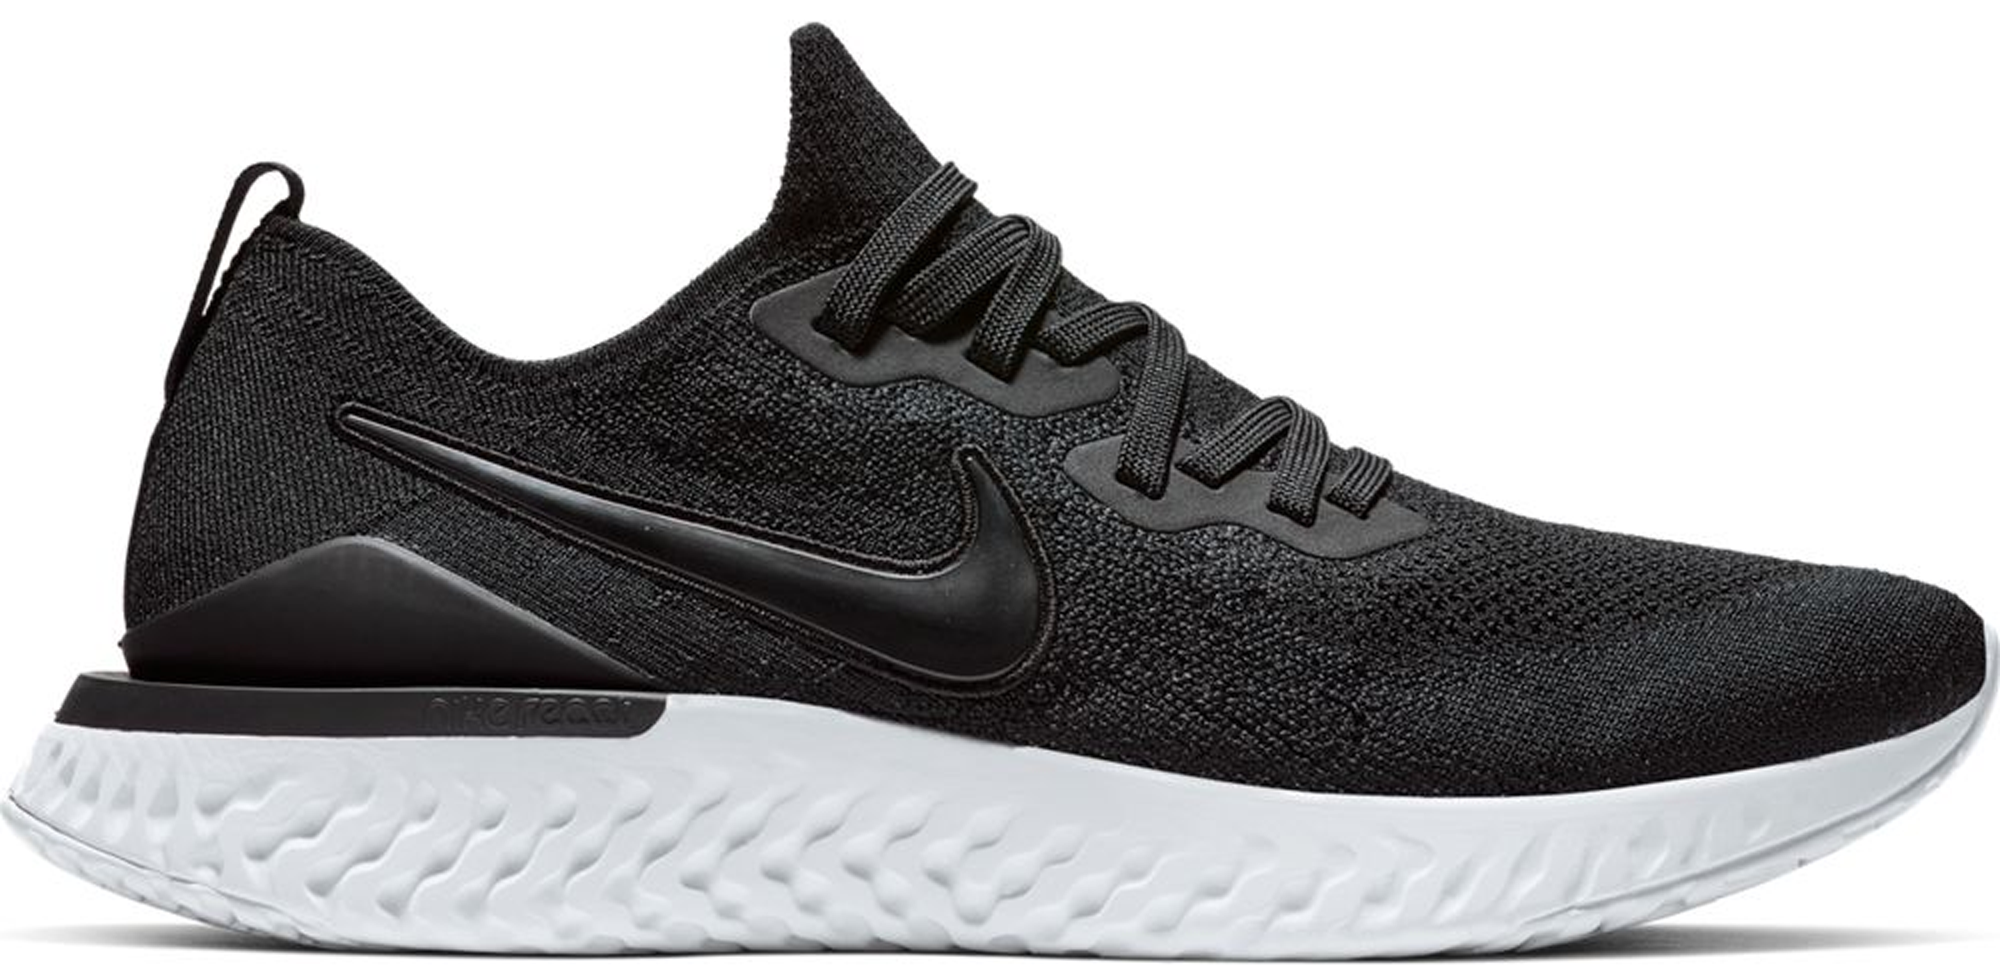 Nike Epic React Flyknit 2 Black White